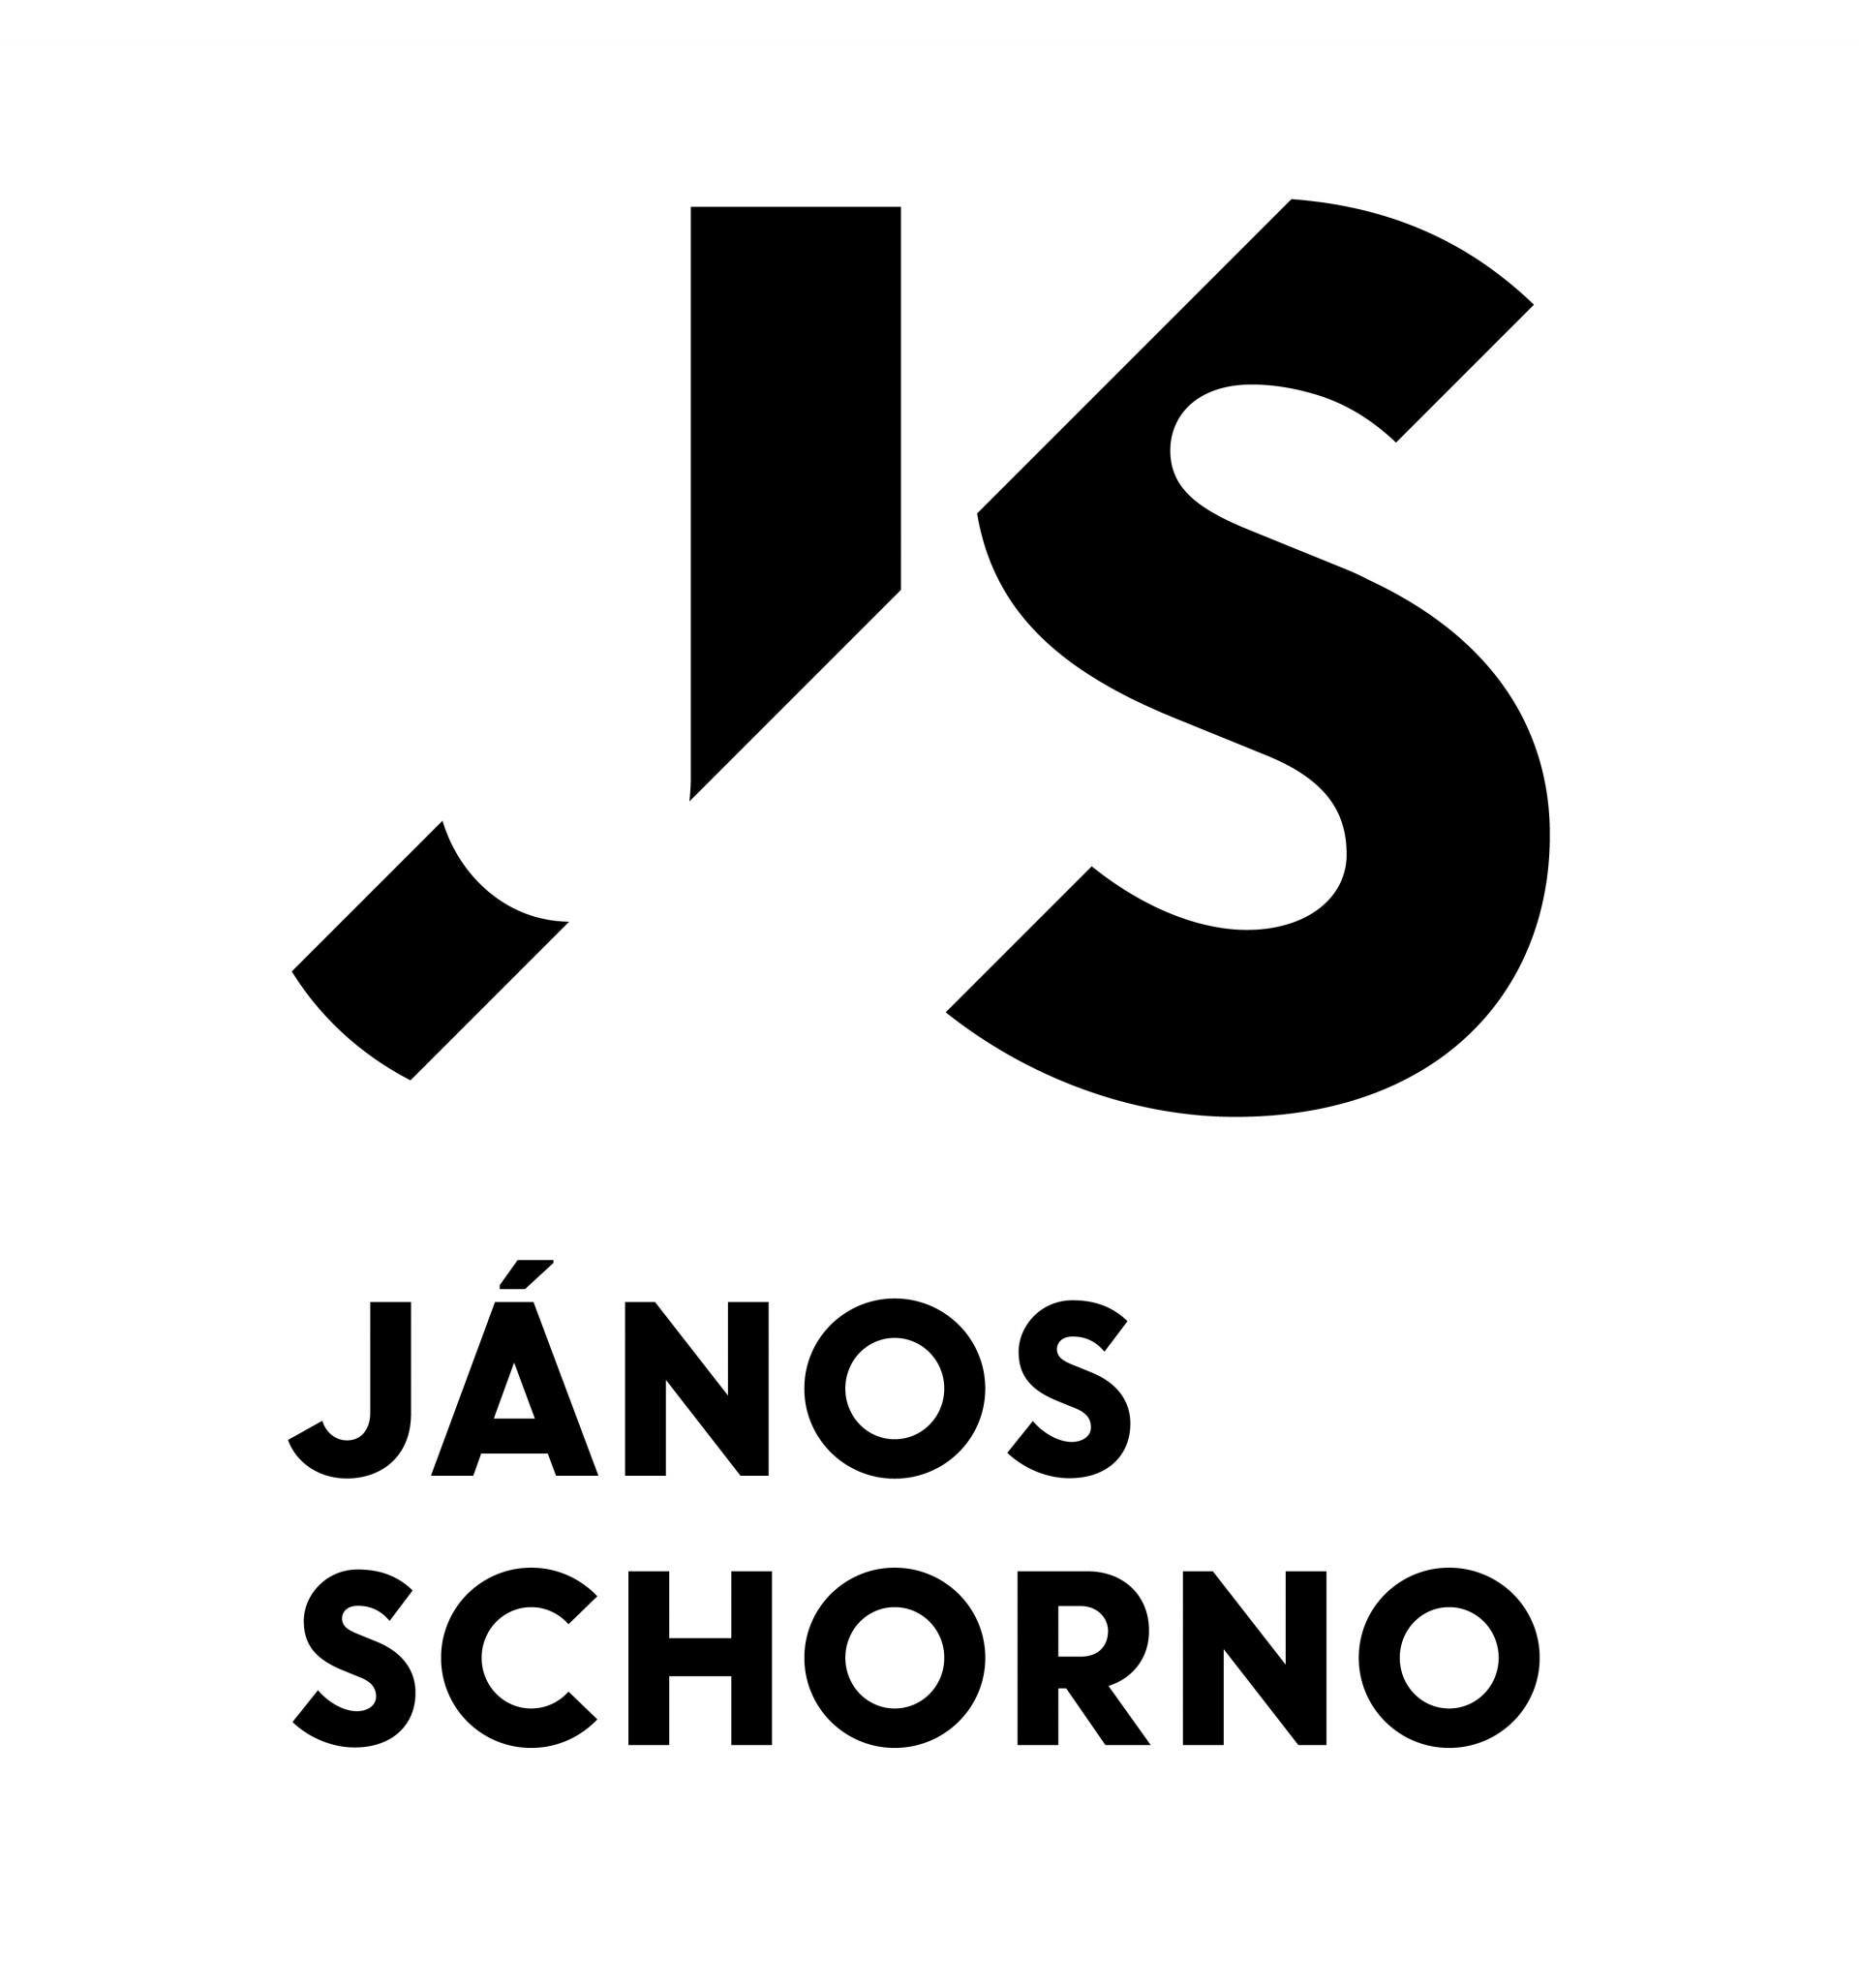 Nadia de Donno Janos Schorno